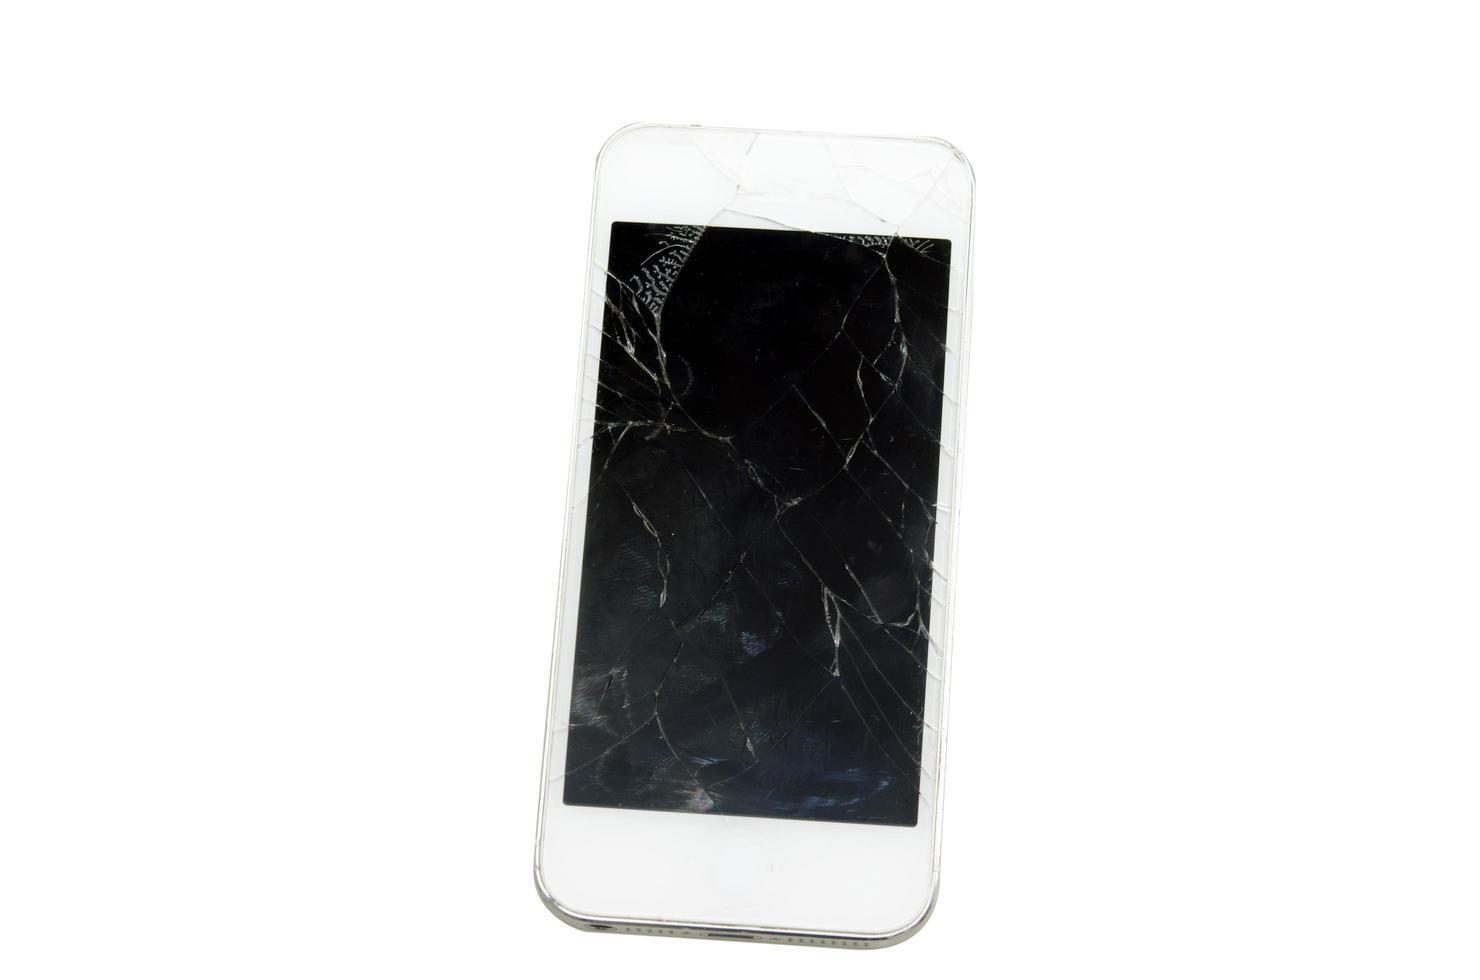 Pantalla del teléfono rota sobre fondo blanco. foto